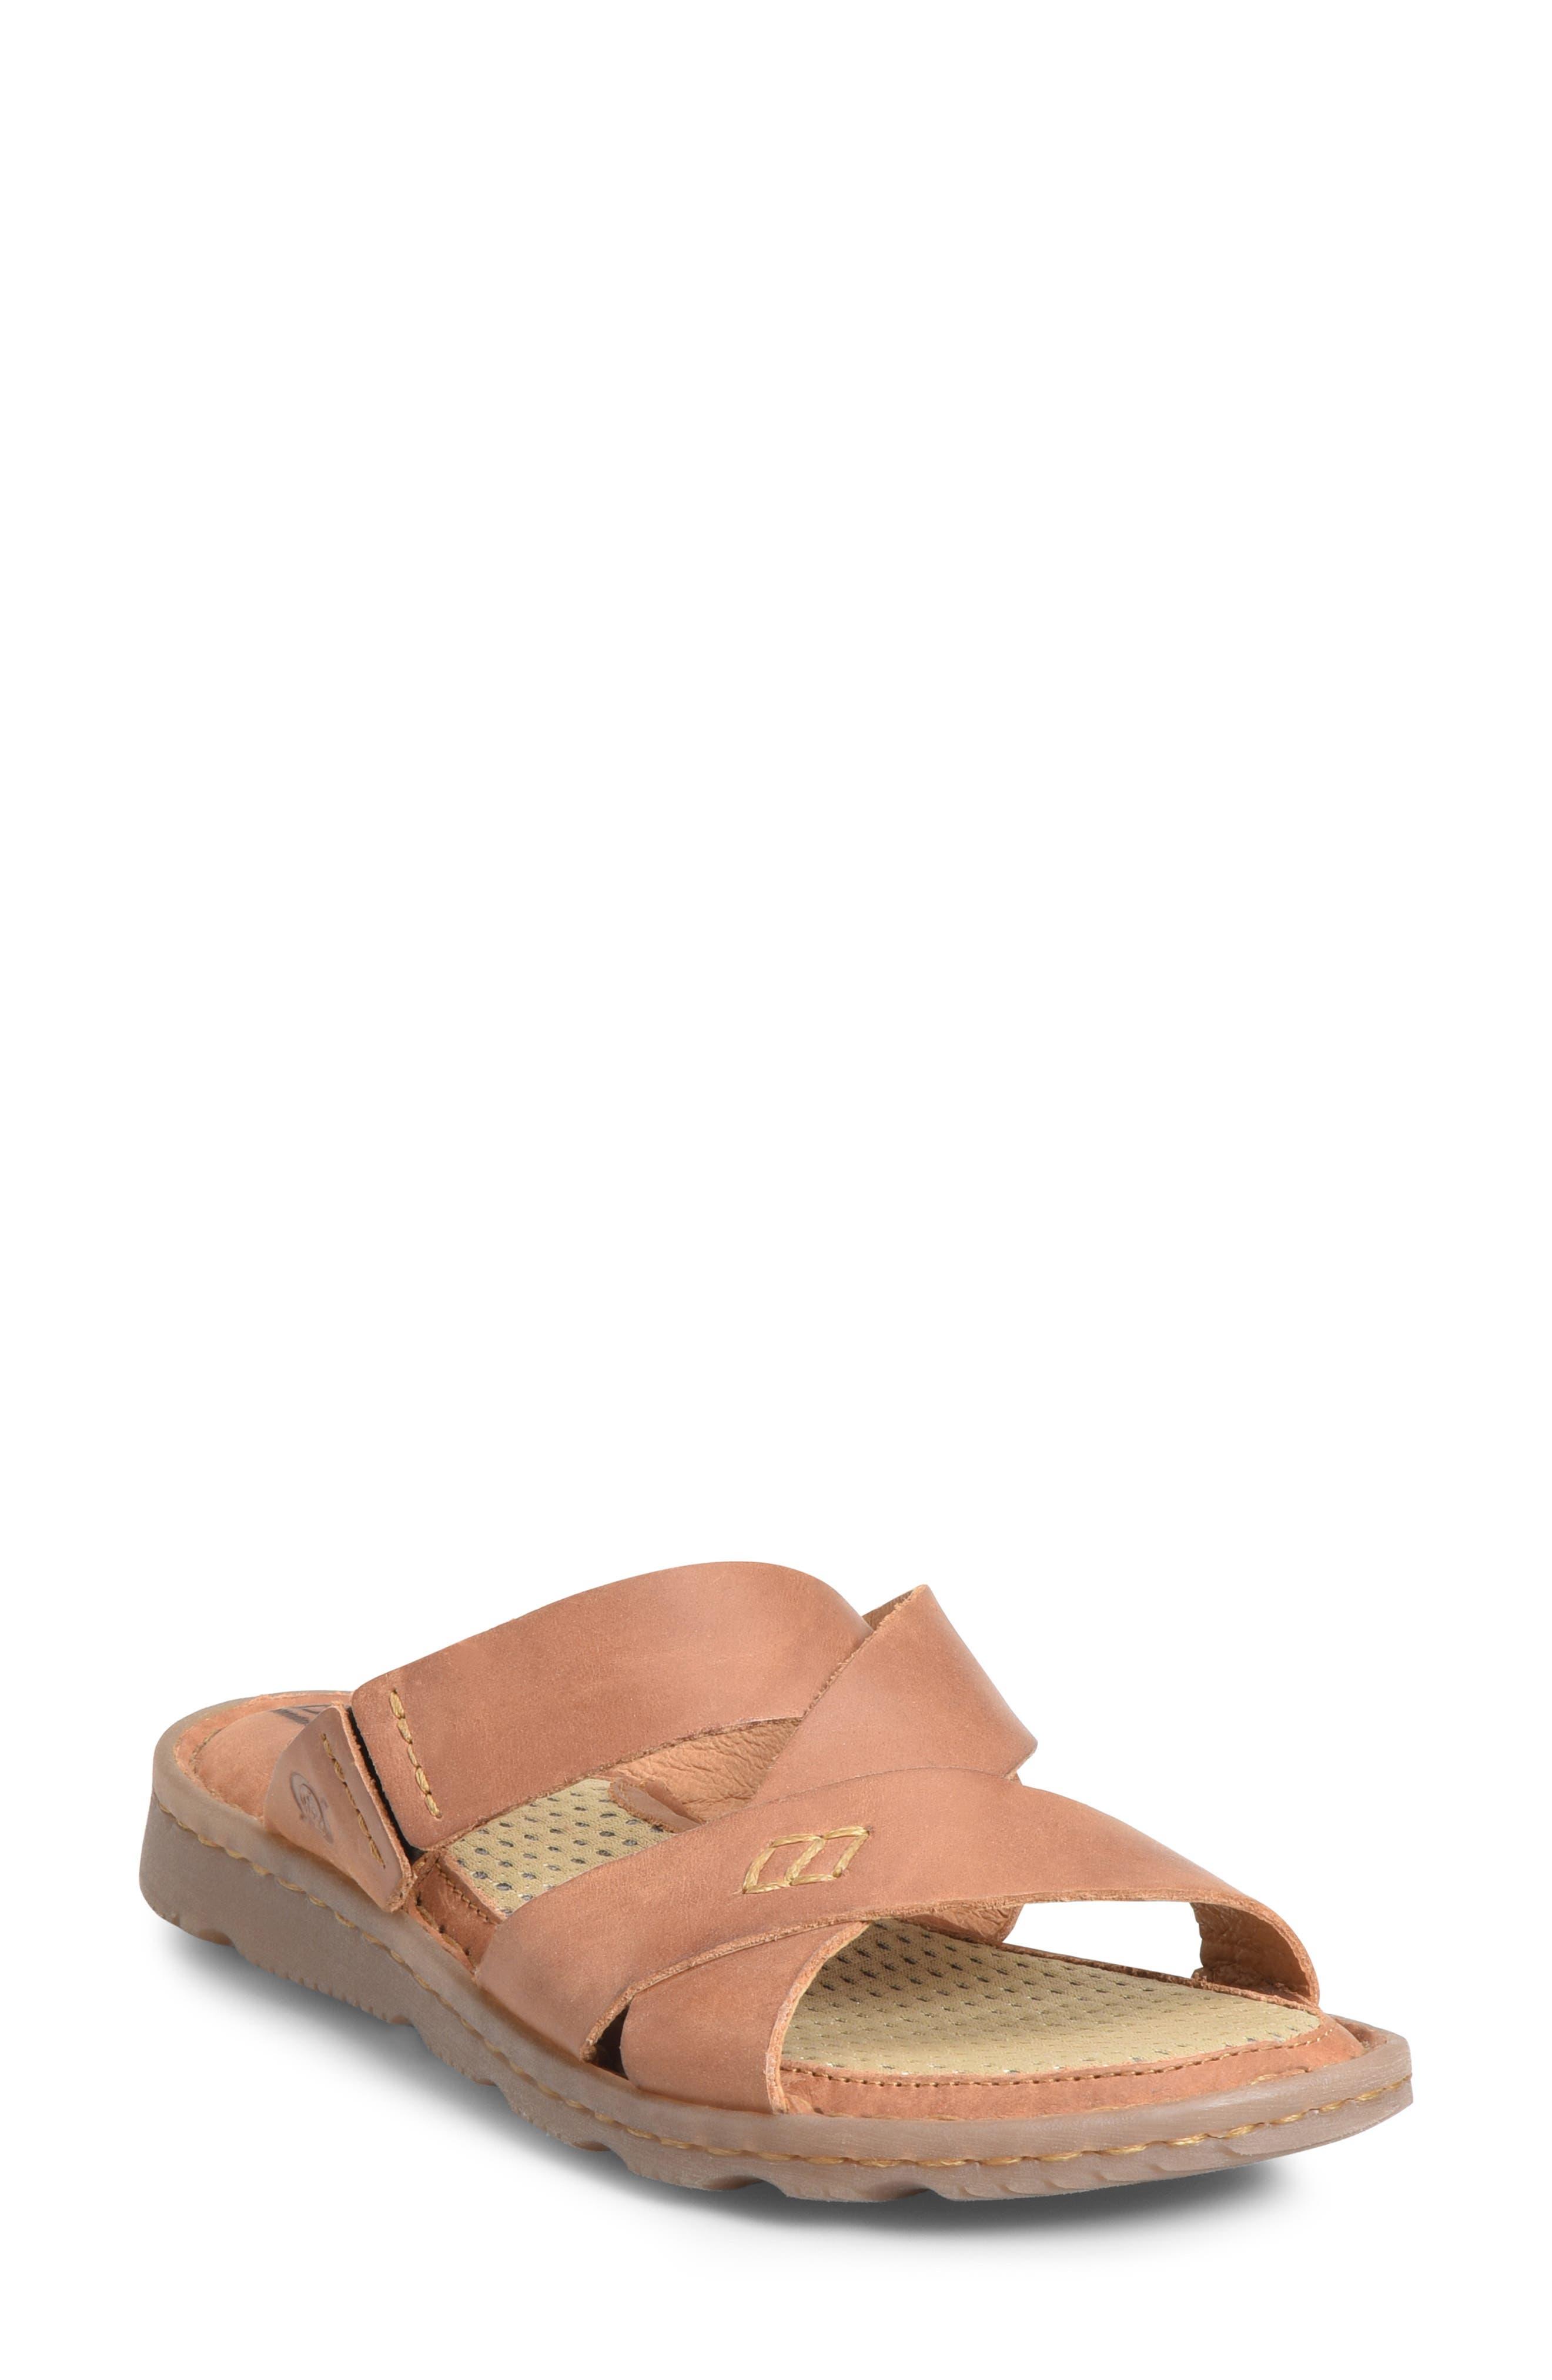 B?rn Hayka Asymmetrical Slide Sandal, Brown